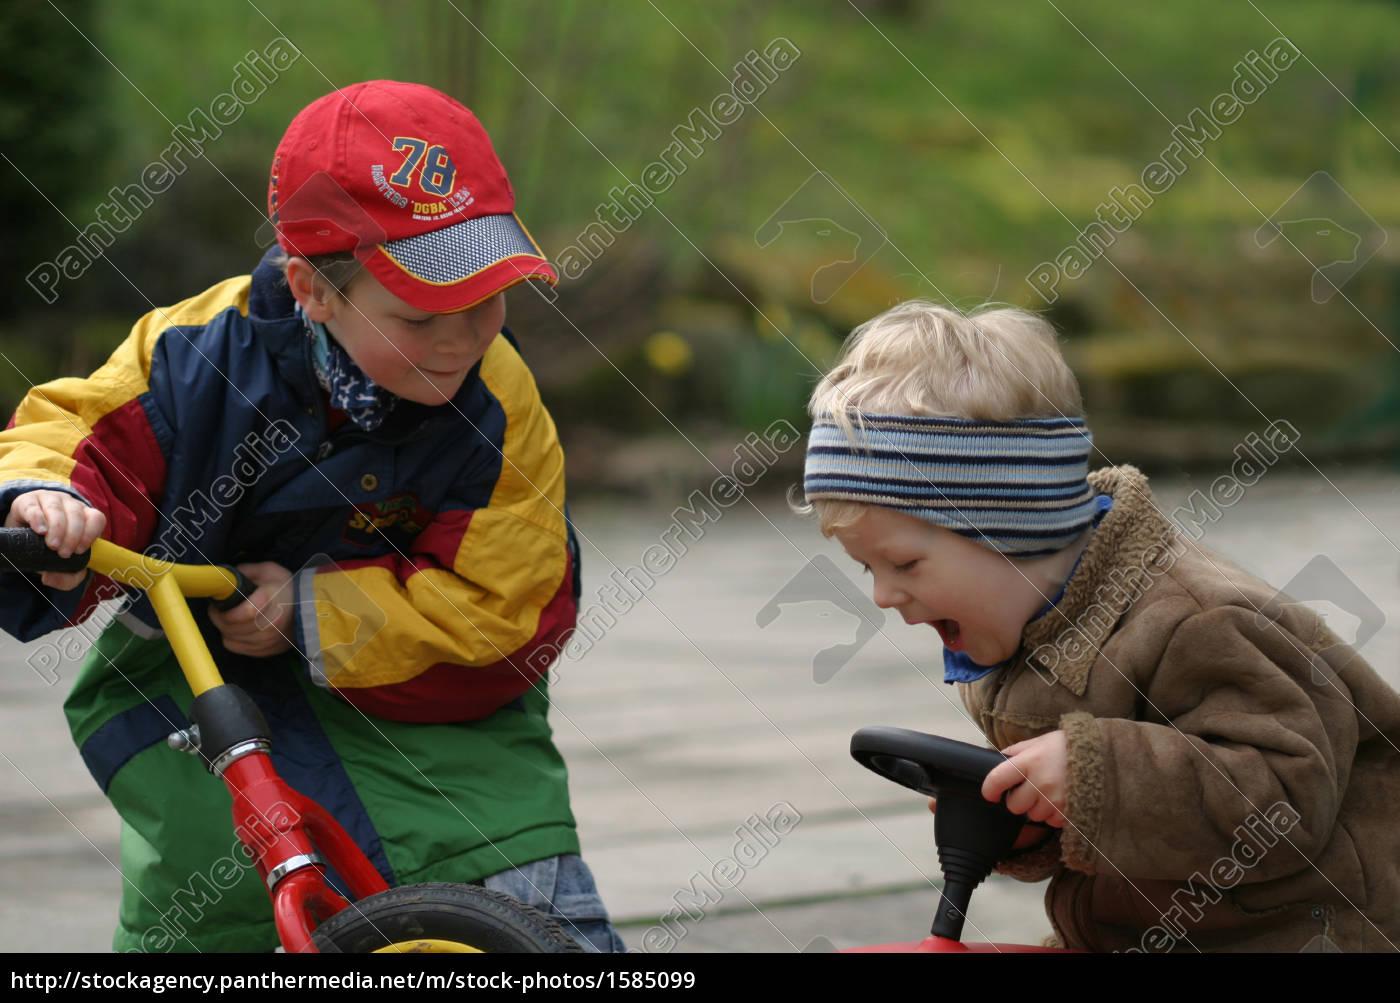 playing, children - 1585099